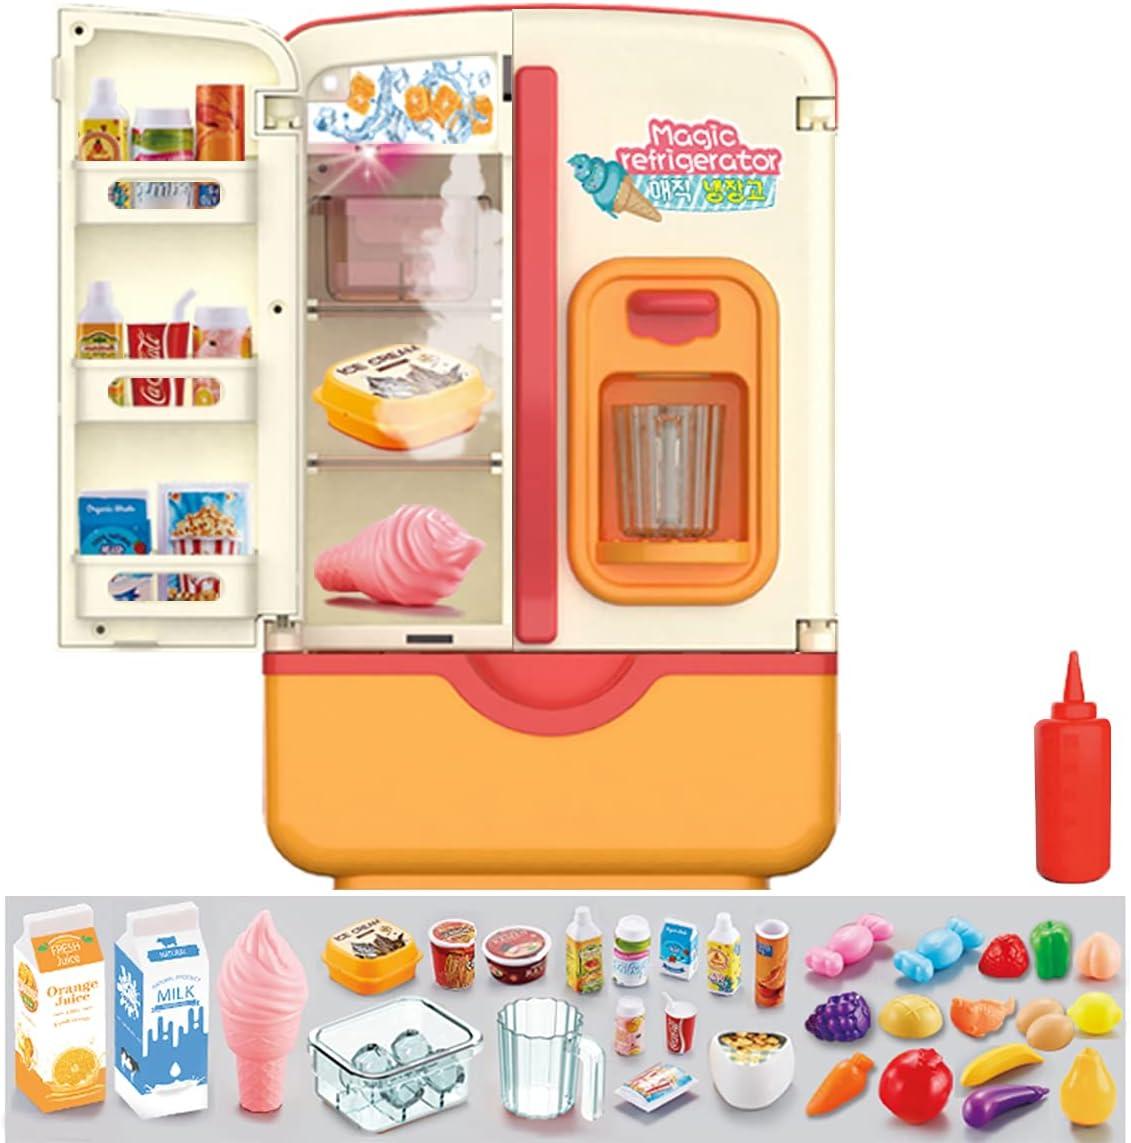 Kitchen Toys Fridge Refrigerator latest with Ice Play Super-cheap Pretend Dispenser